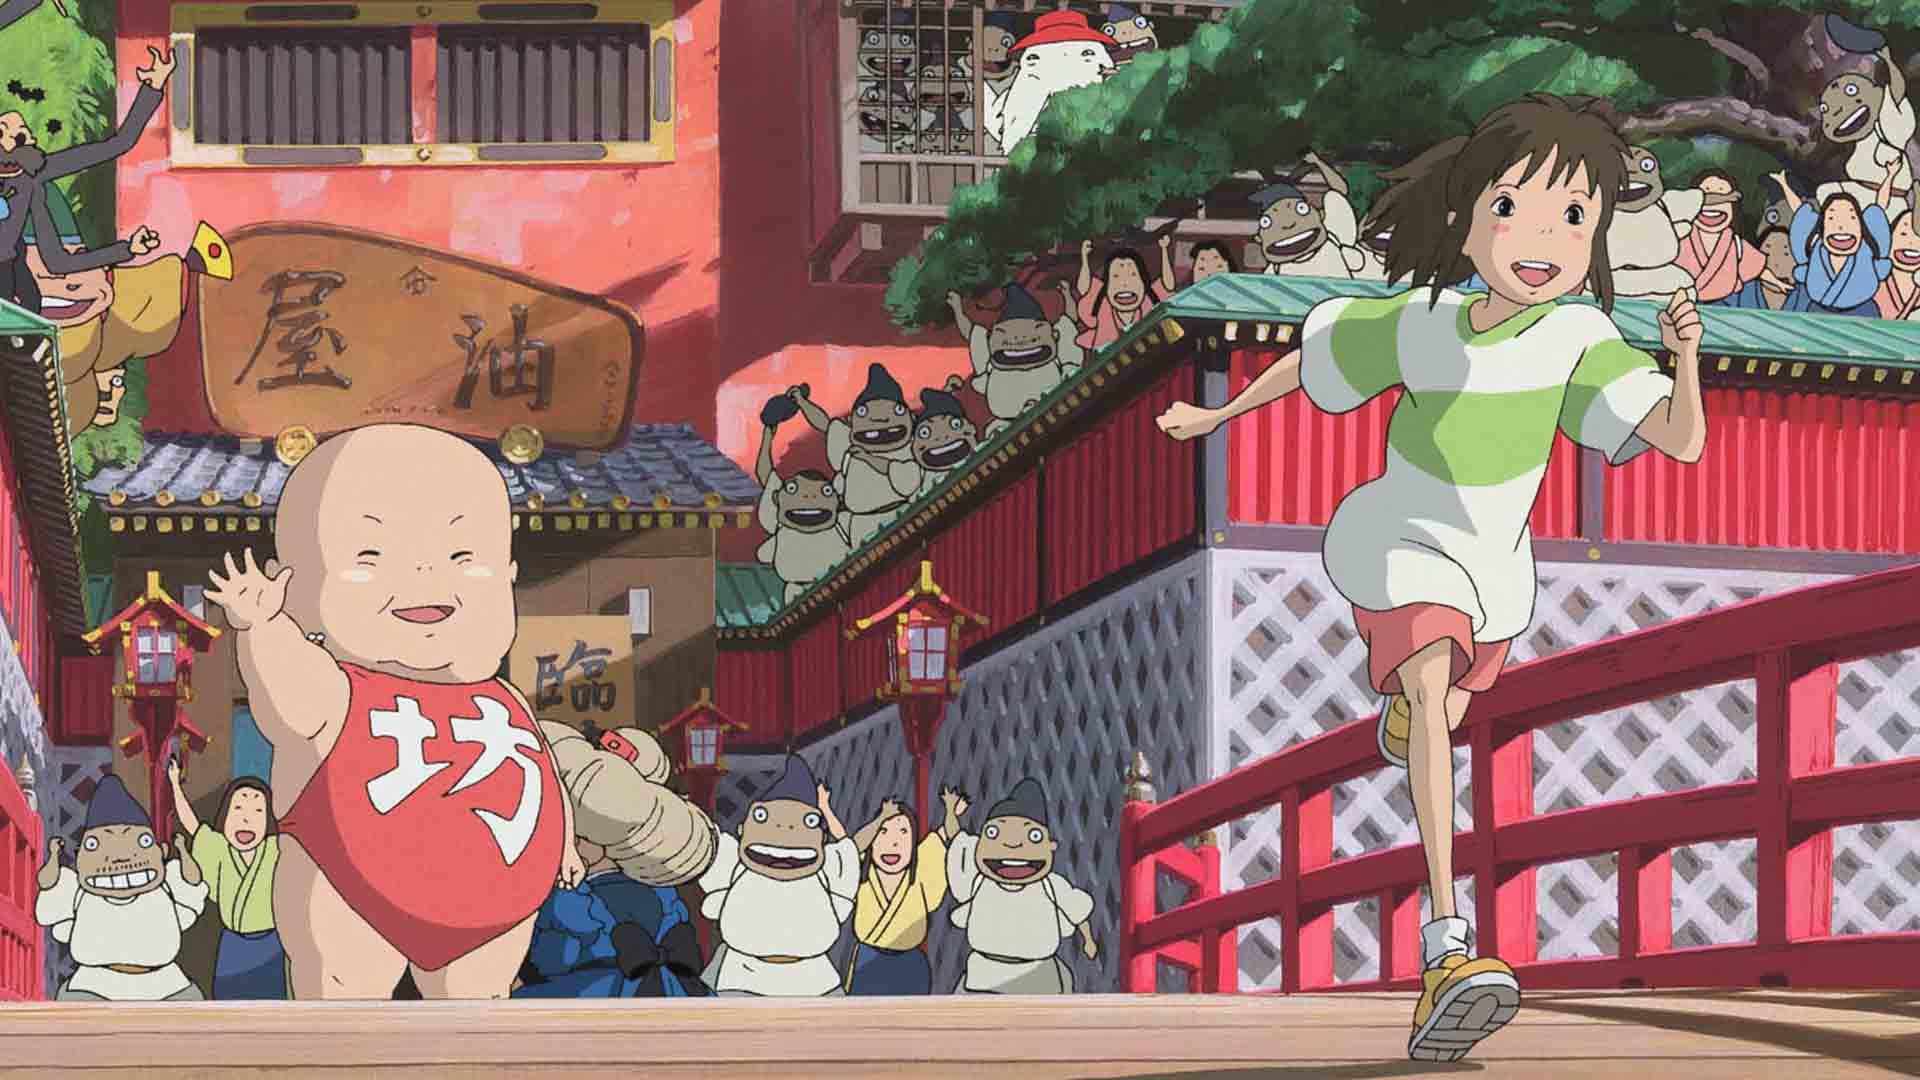 La città incantata di Hayao Miyazaki